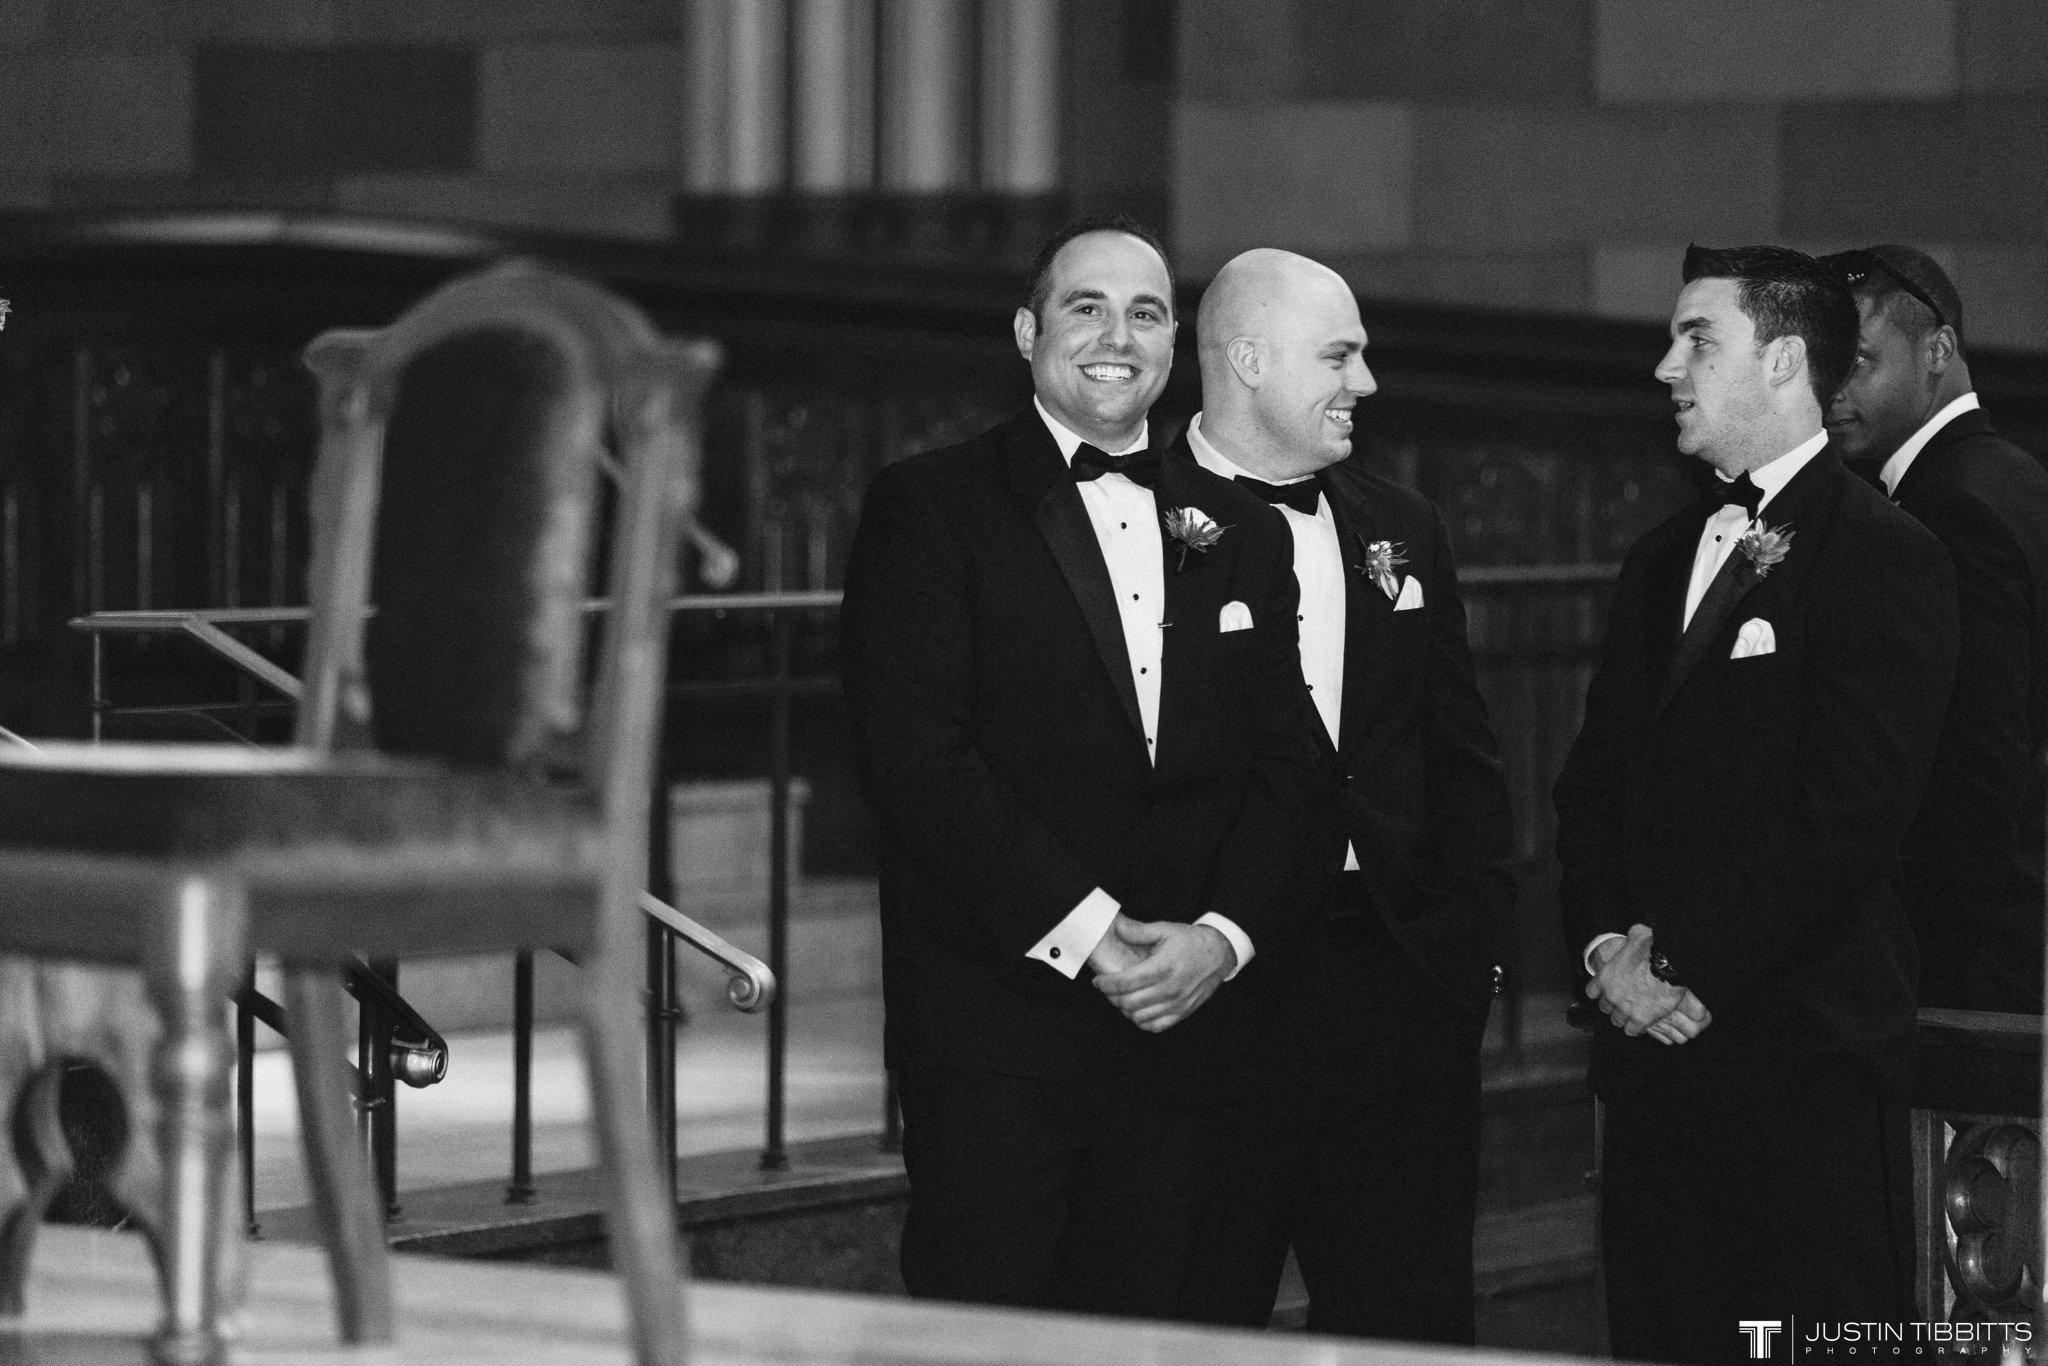 state-room-wedding-photos-with-amanda-and-nick_0070